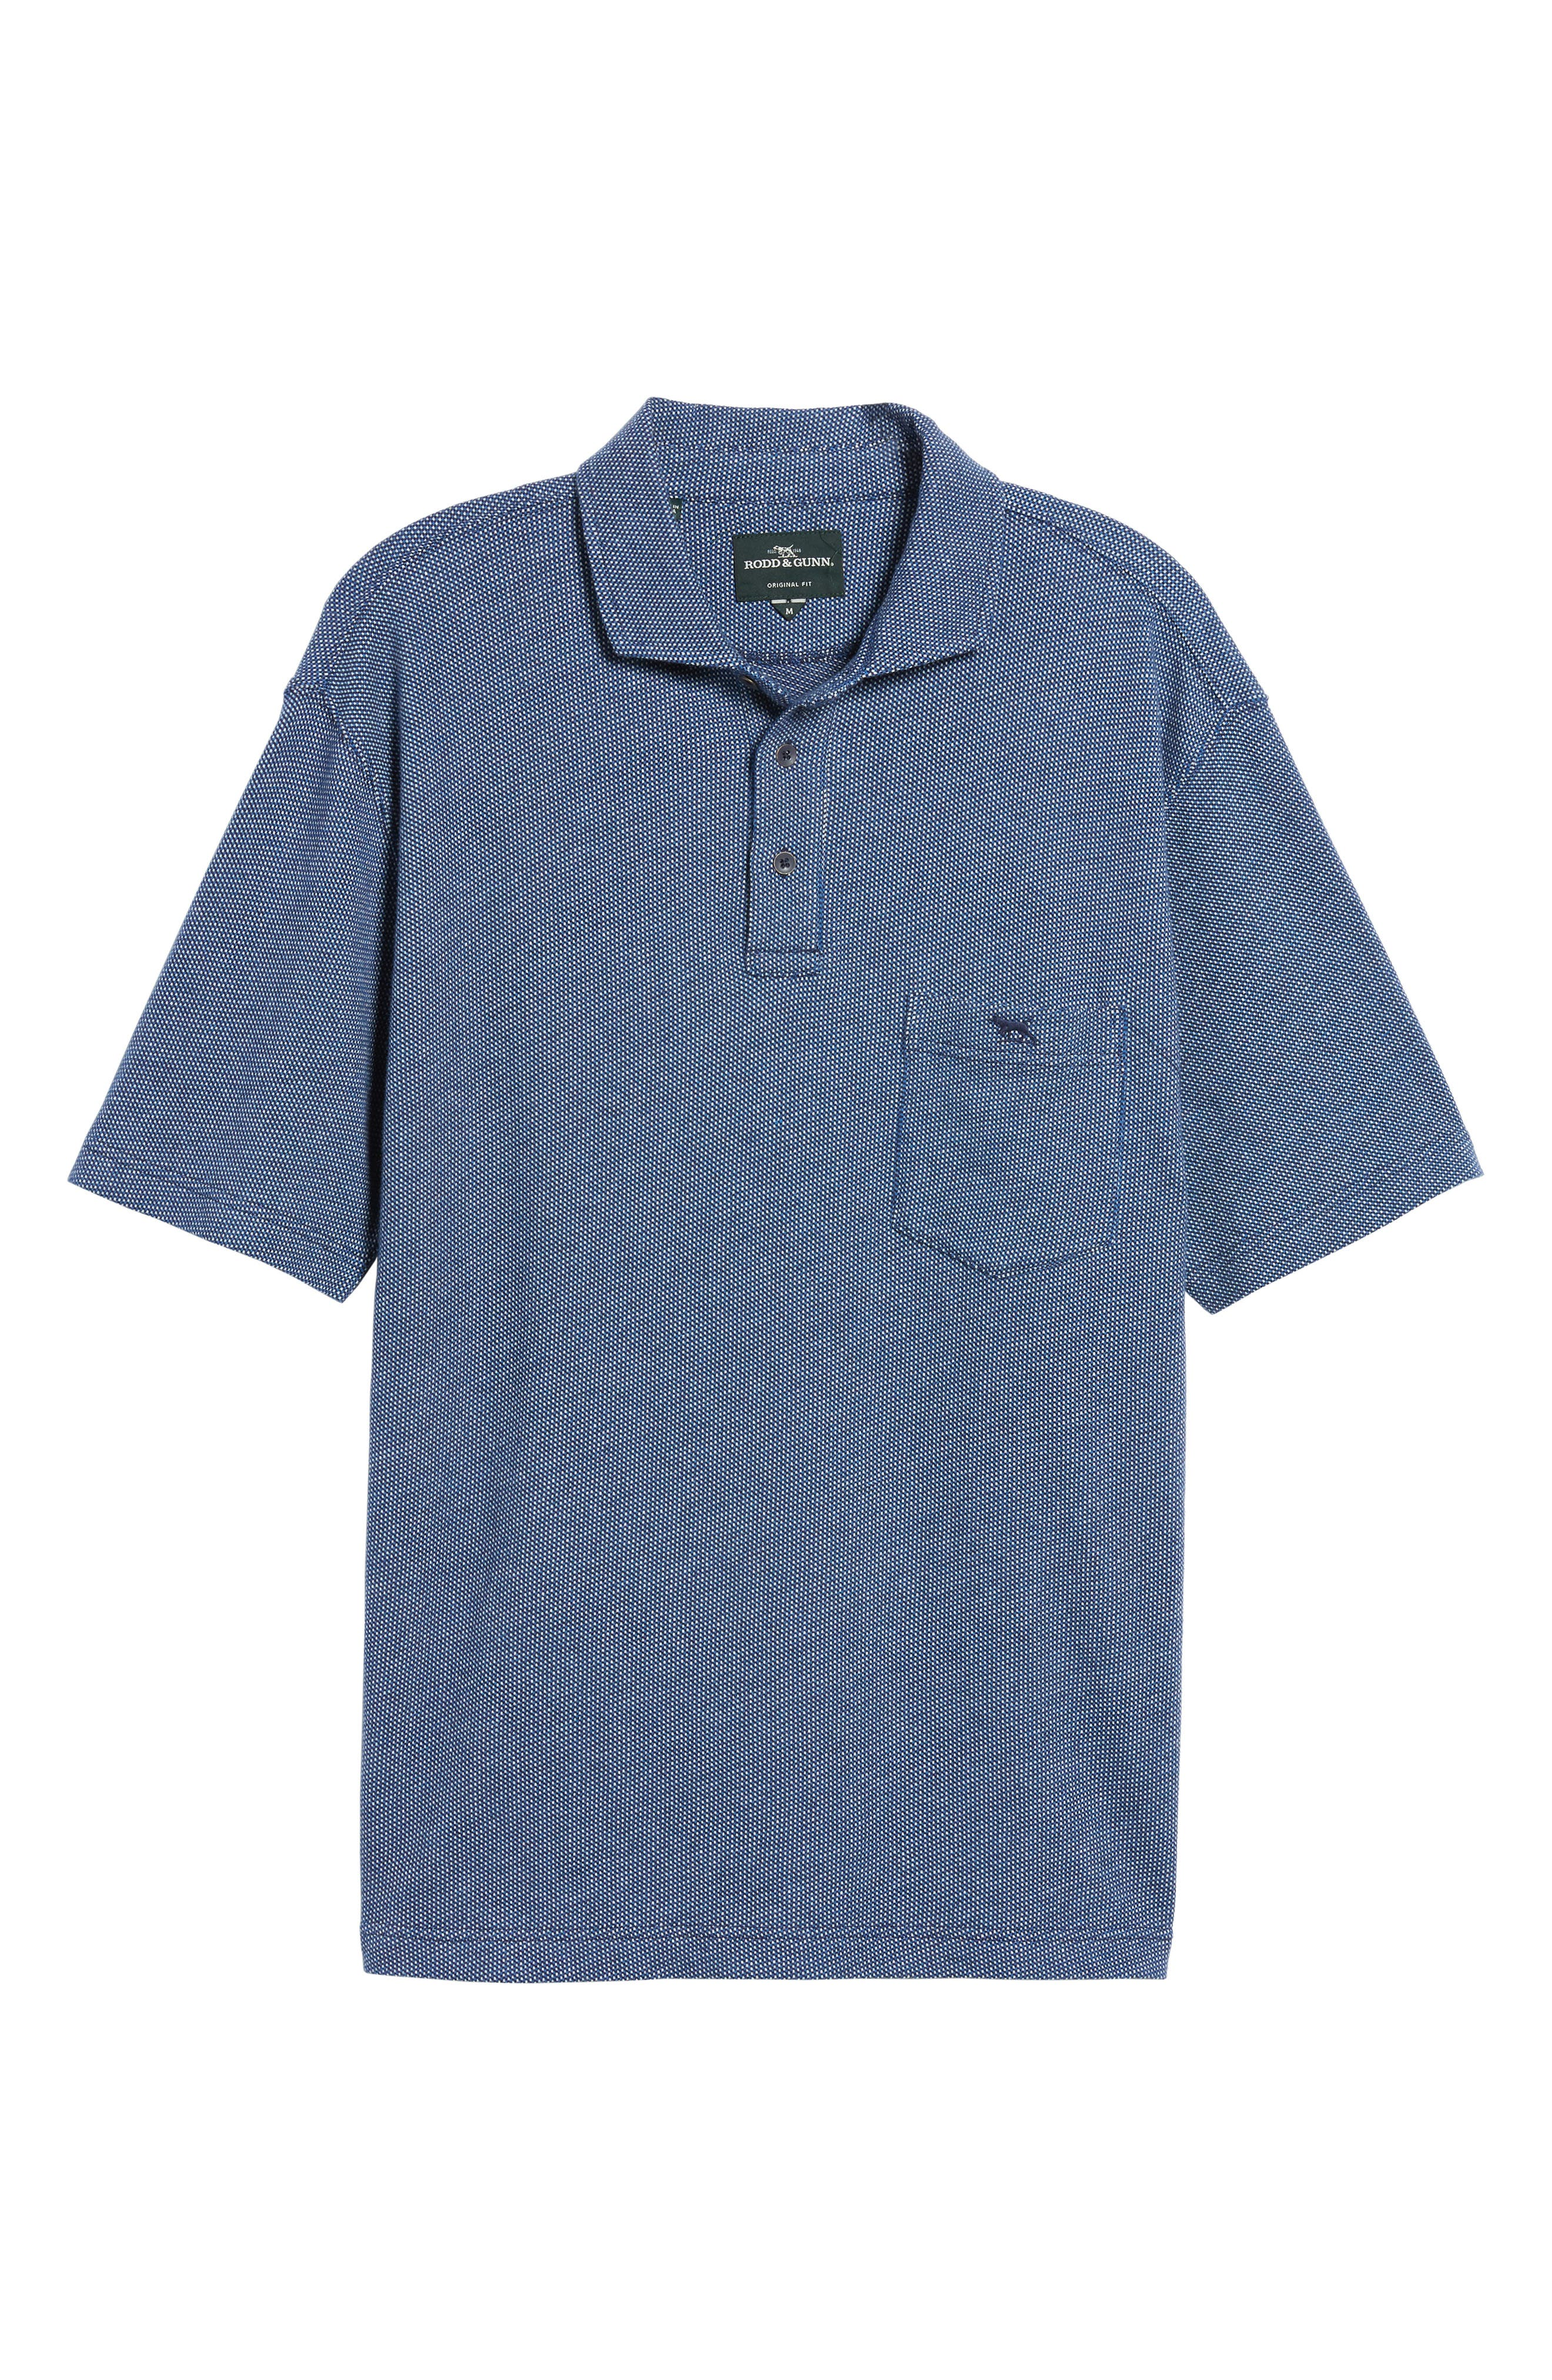 Springs Flat Regular Fit Polo,                             Alternate thumbnail 6, color,                             433